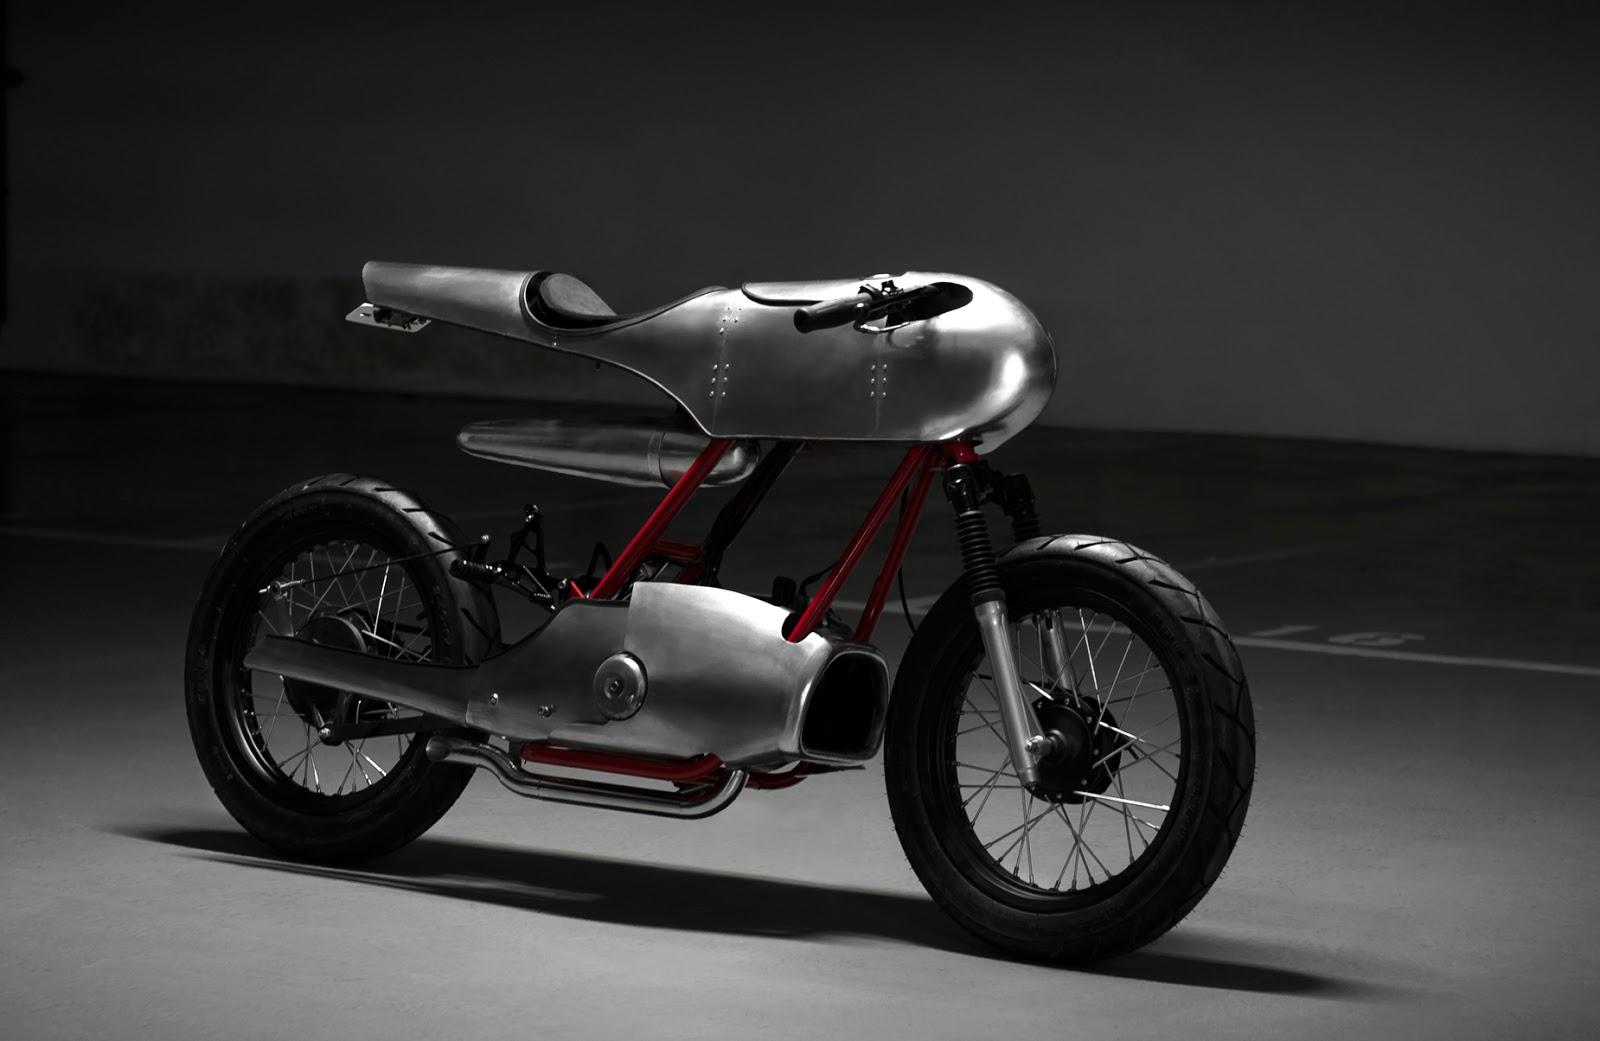 For Motorcycle Fans 1970 Honda Cb 90 Super Cub Roadrunner Concept